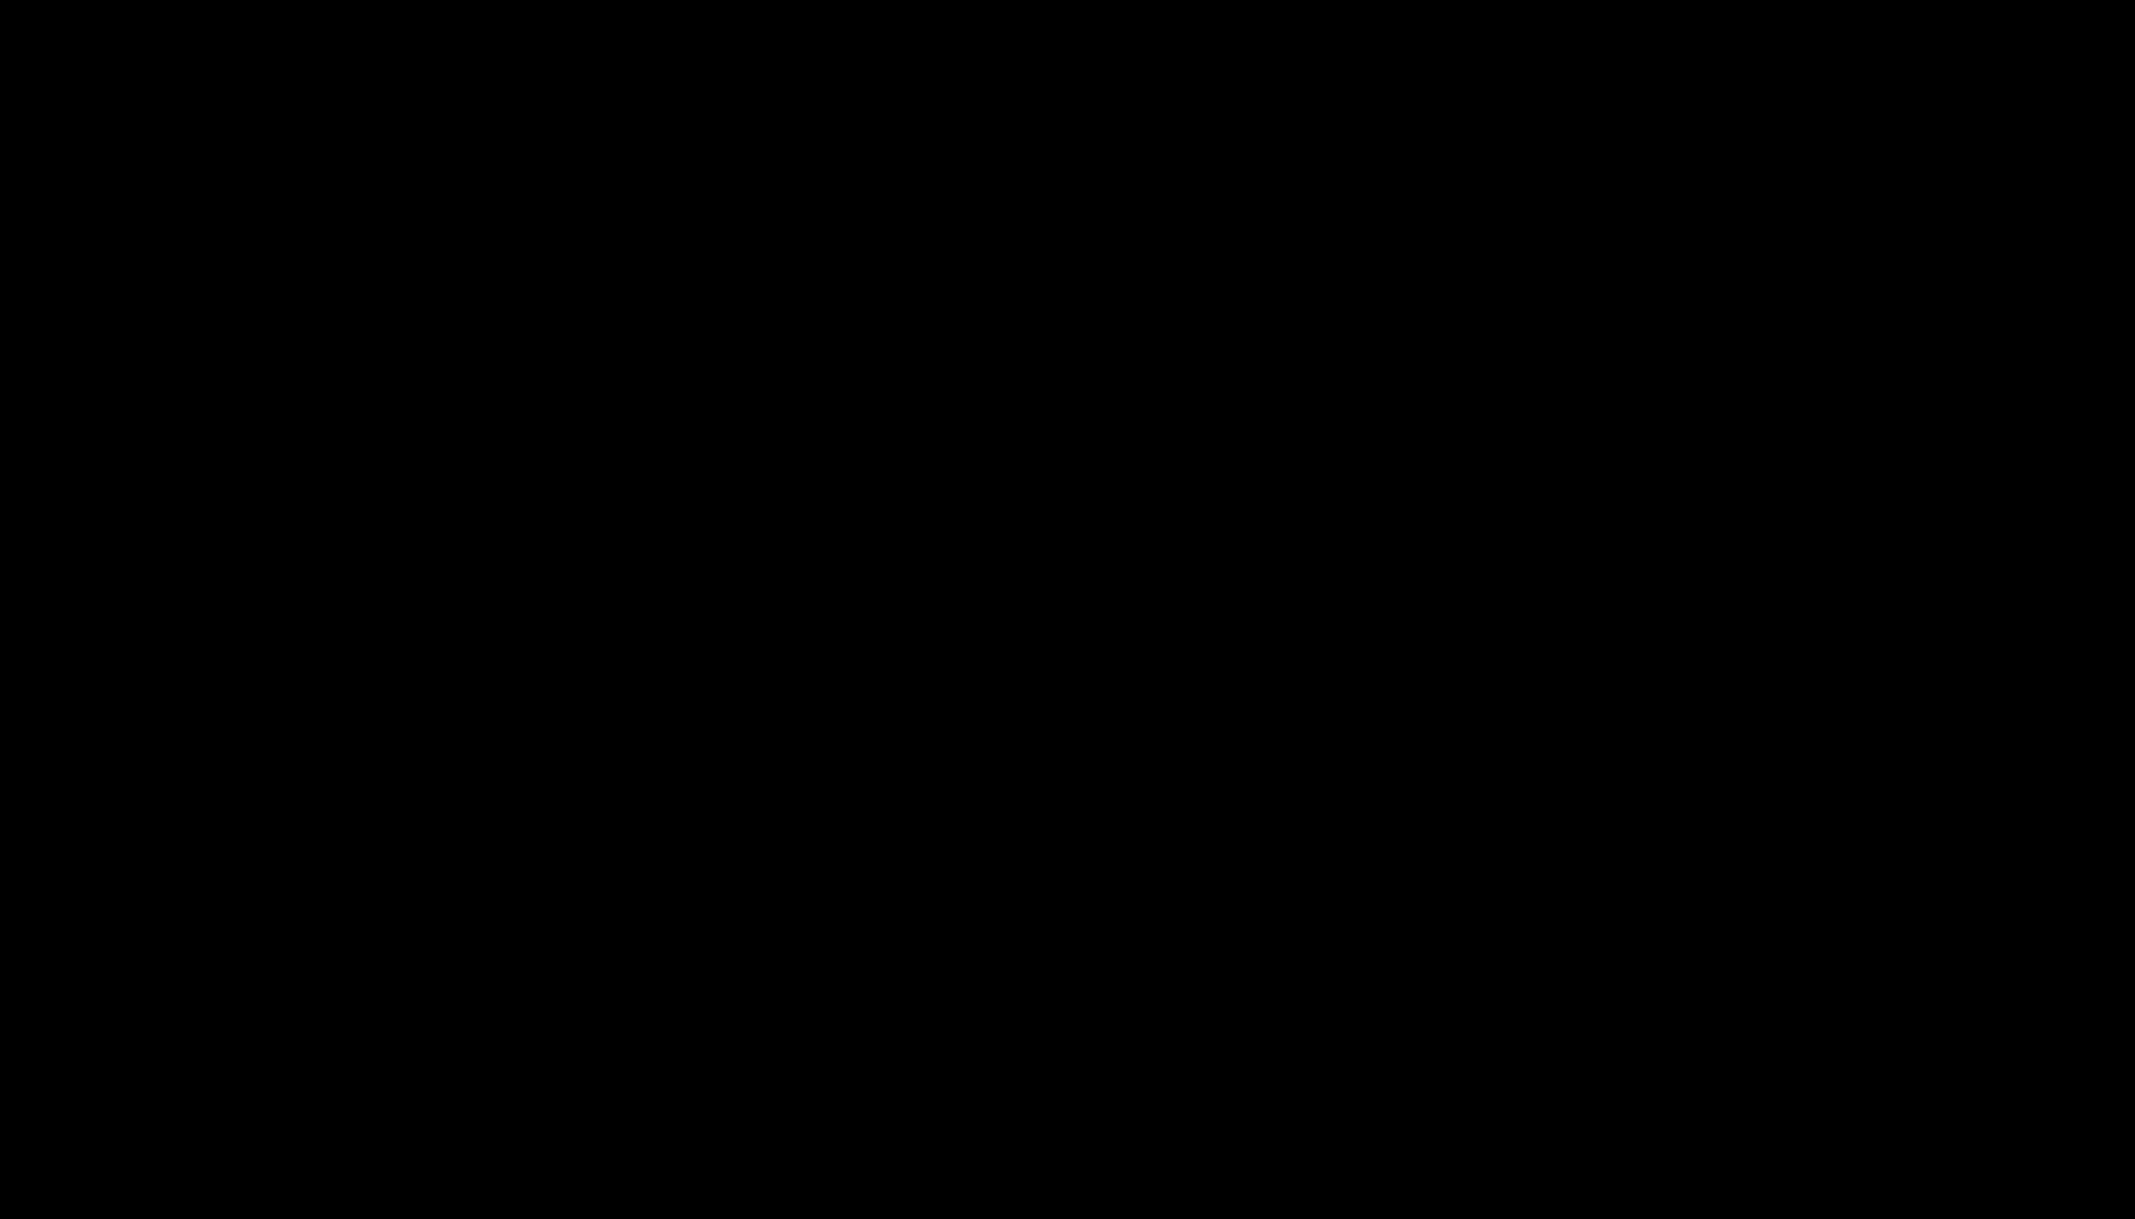 2135x1219 Clipart